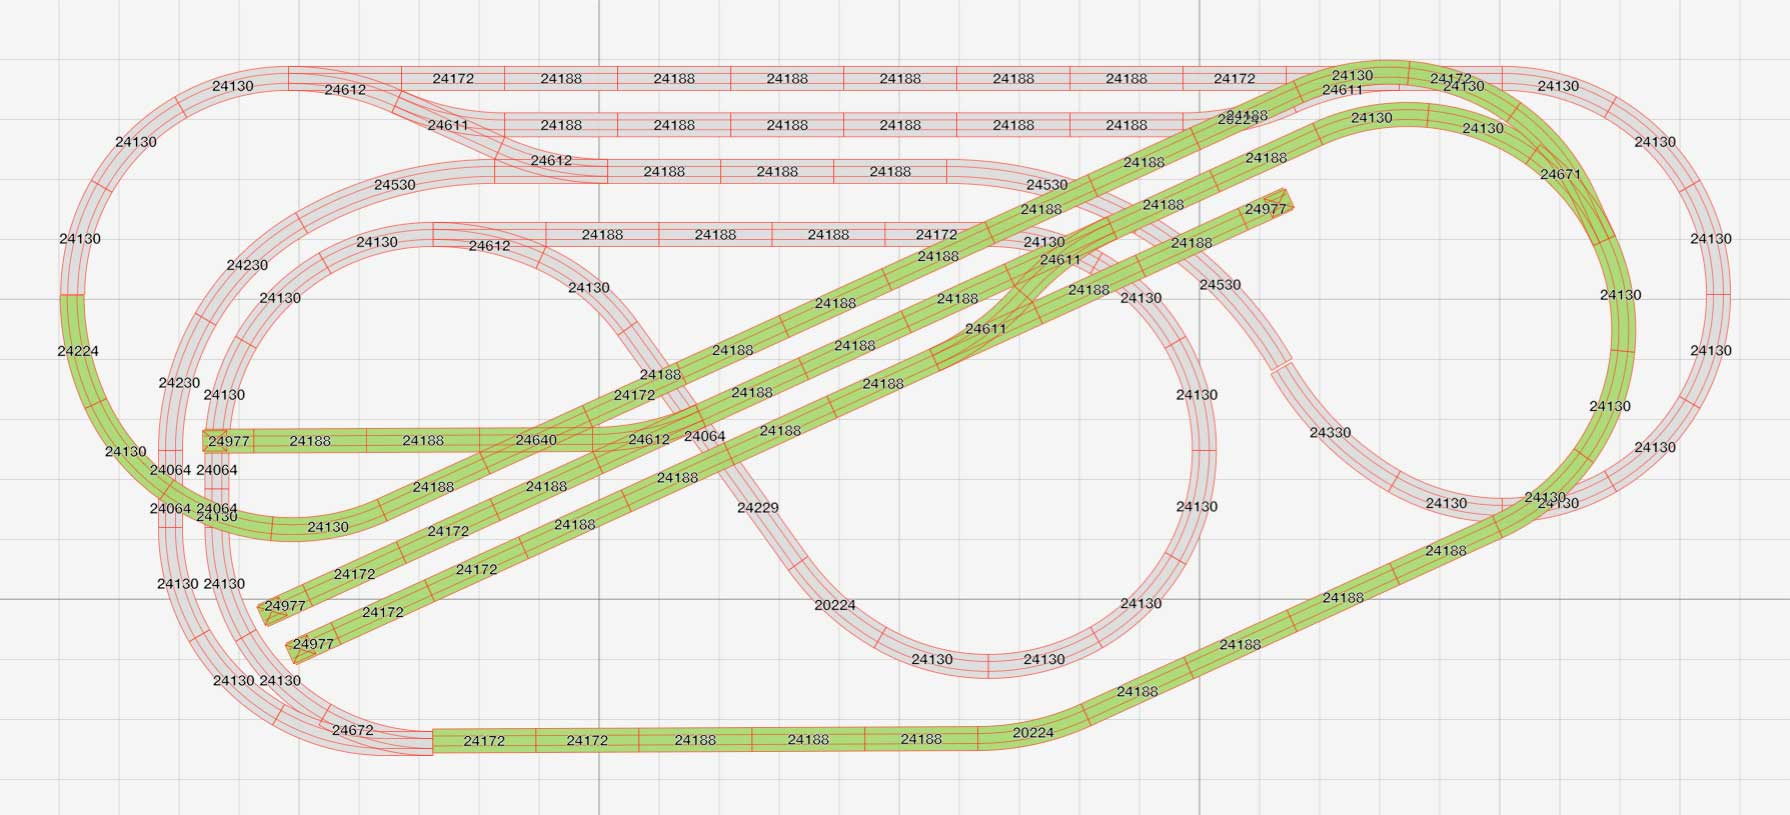 Gleisplan-H0-maerklin-c-gleis-3mx1,4m-001 3